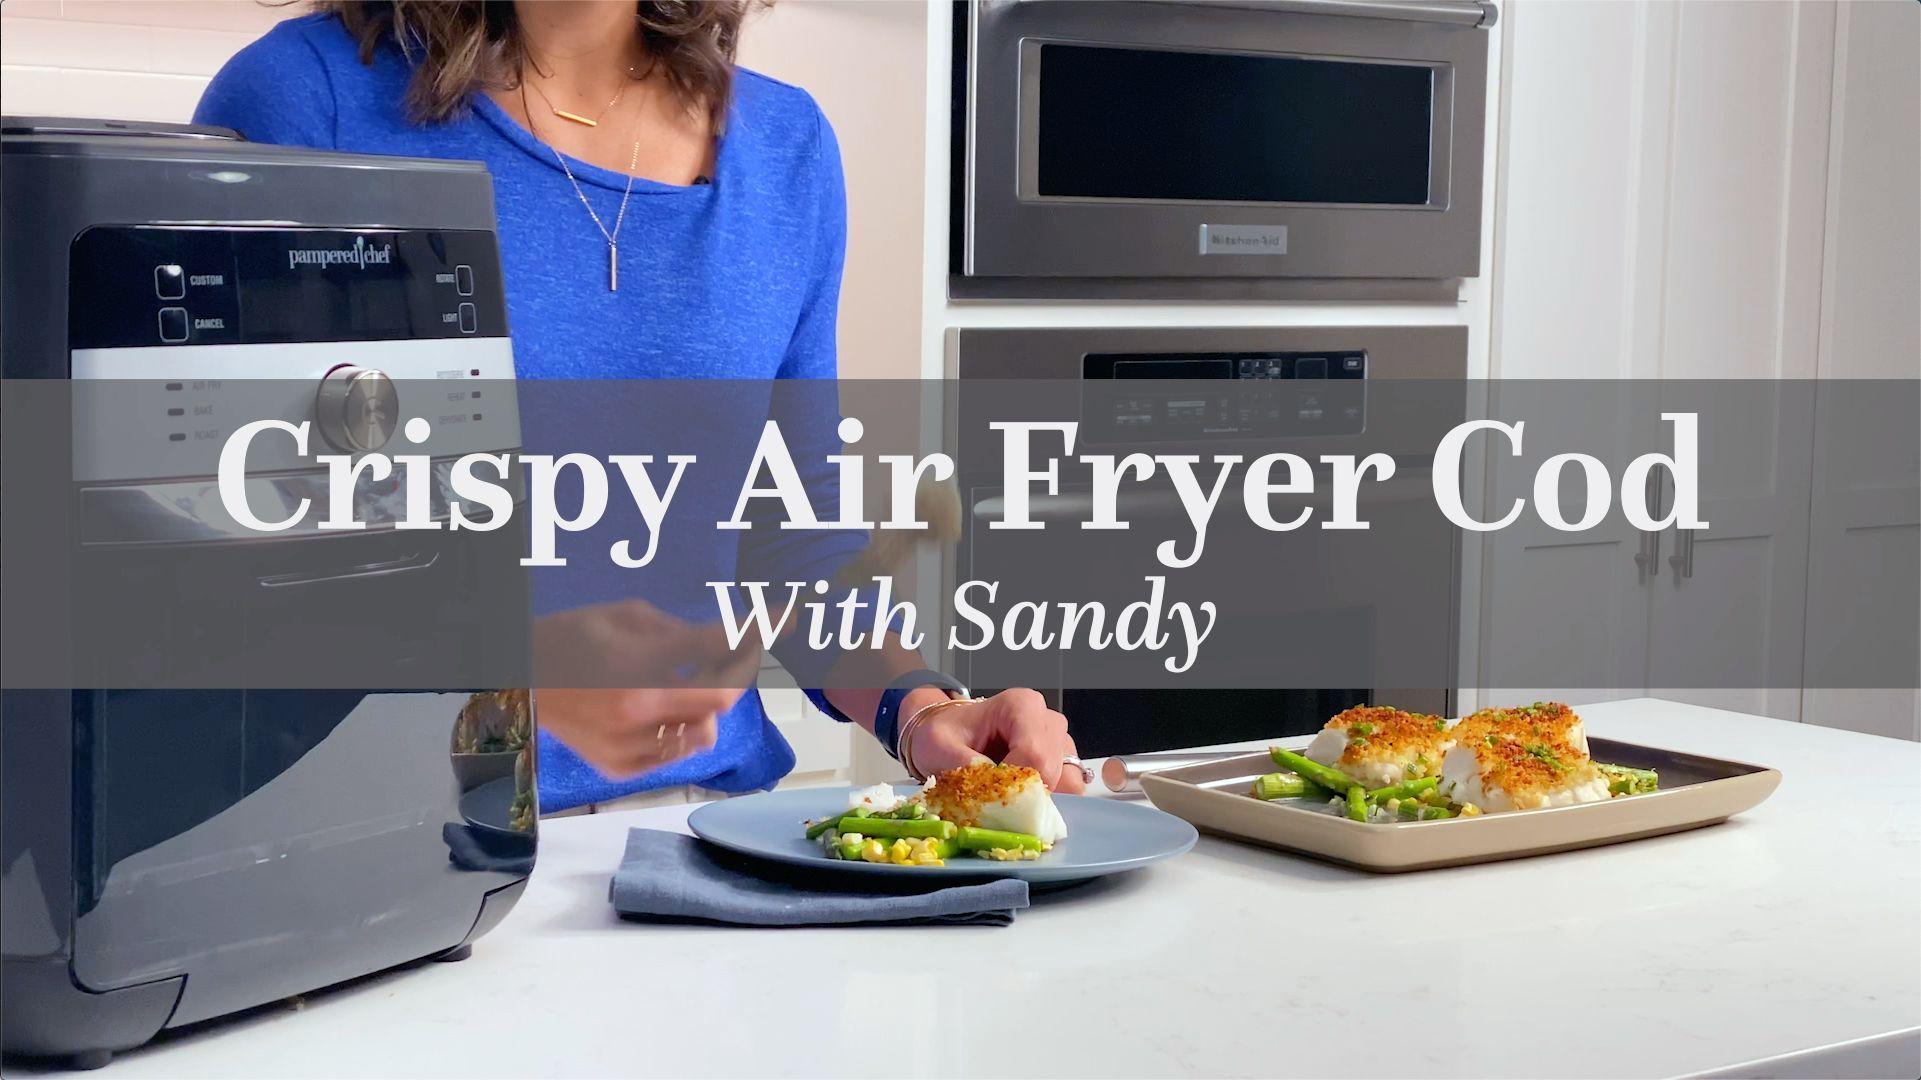 crispy air fryer cod